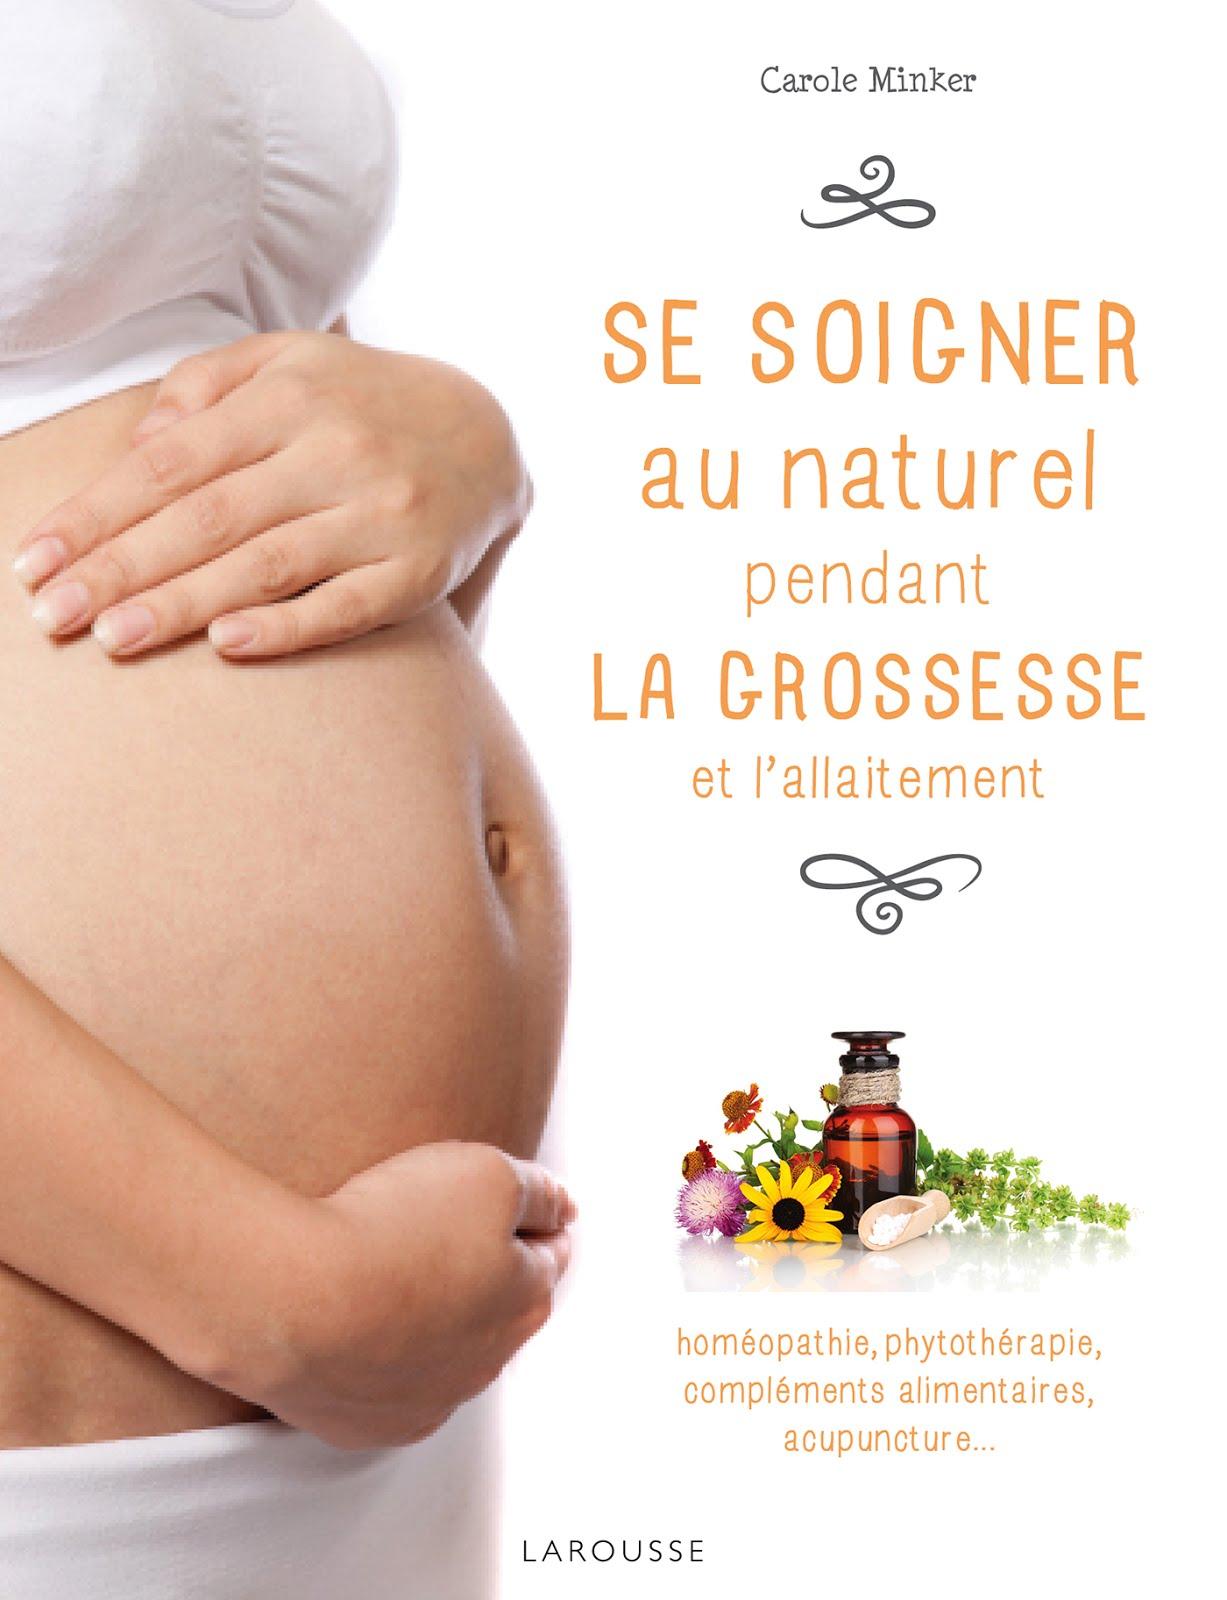 Se soigner au naturel pendant la grossesse et l'allaitement